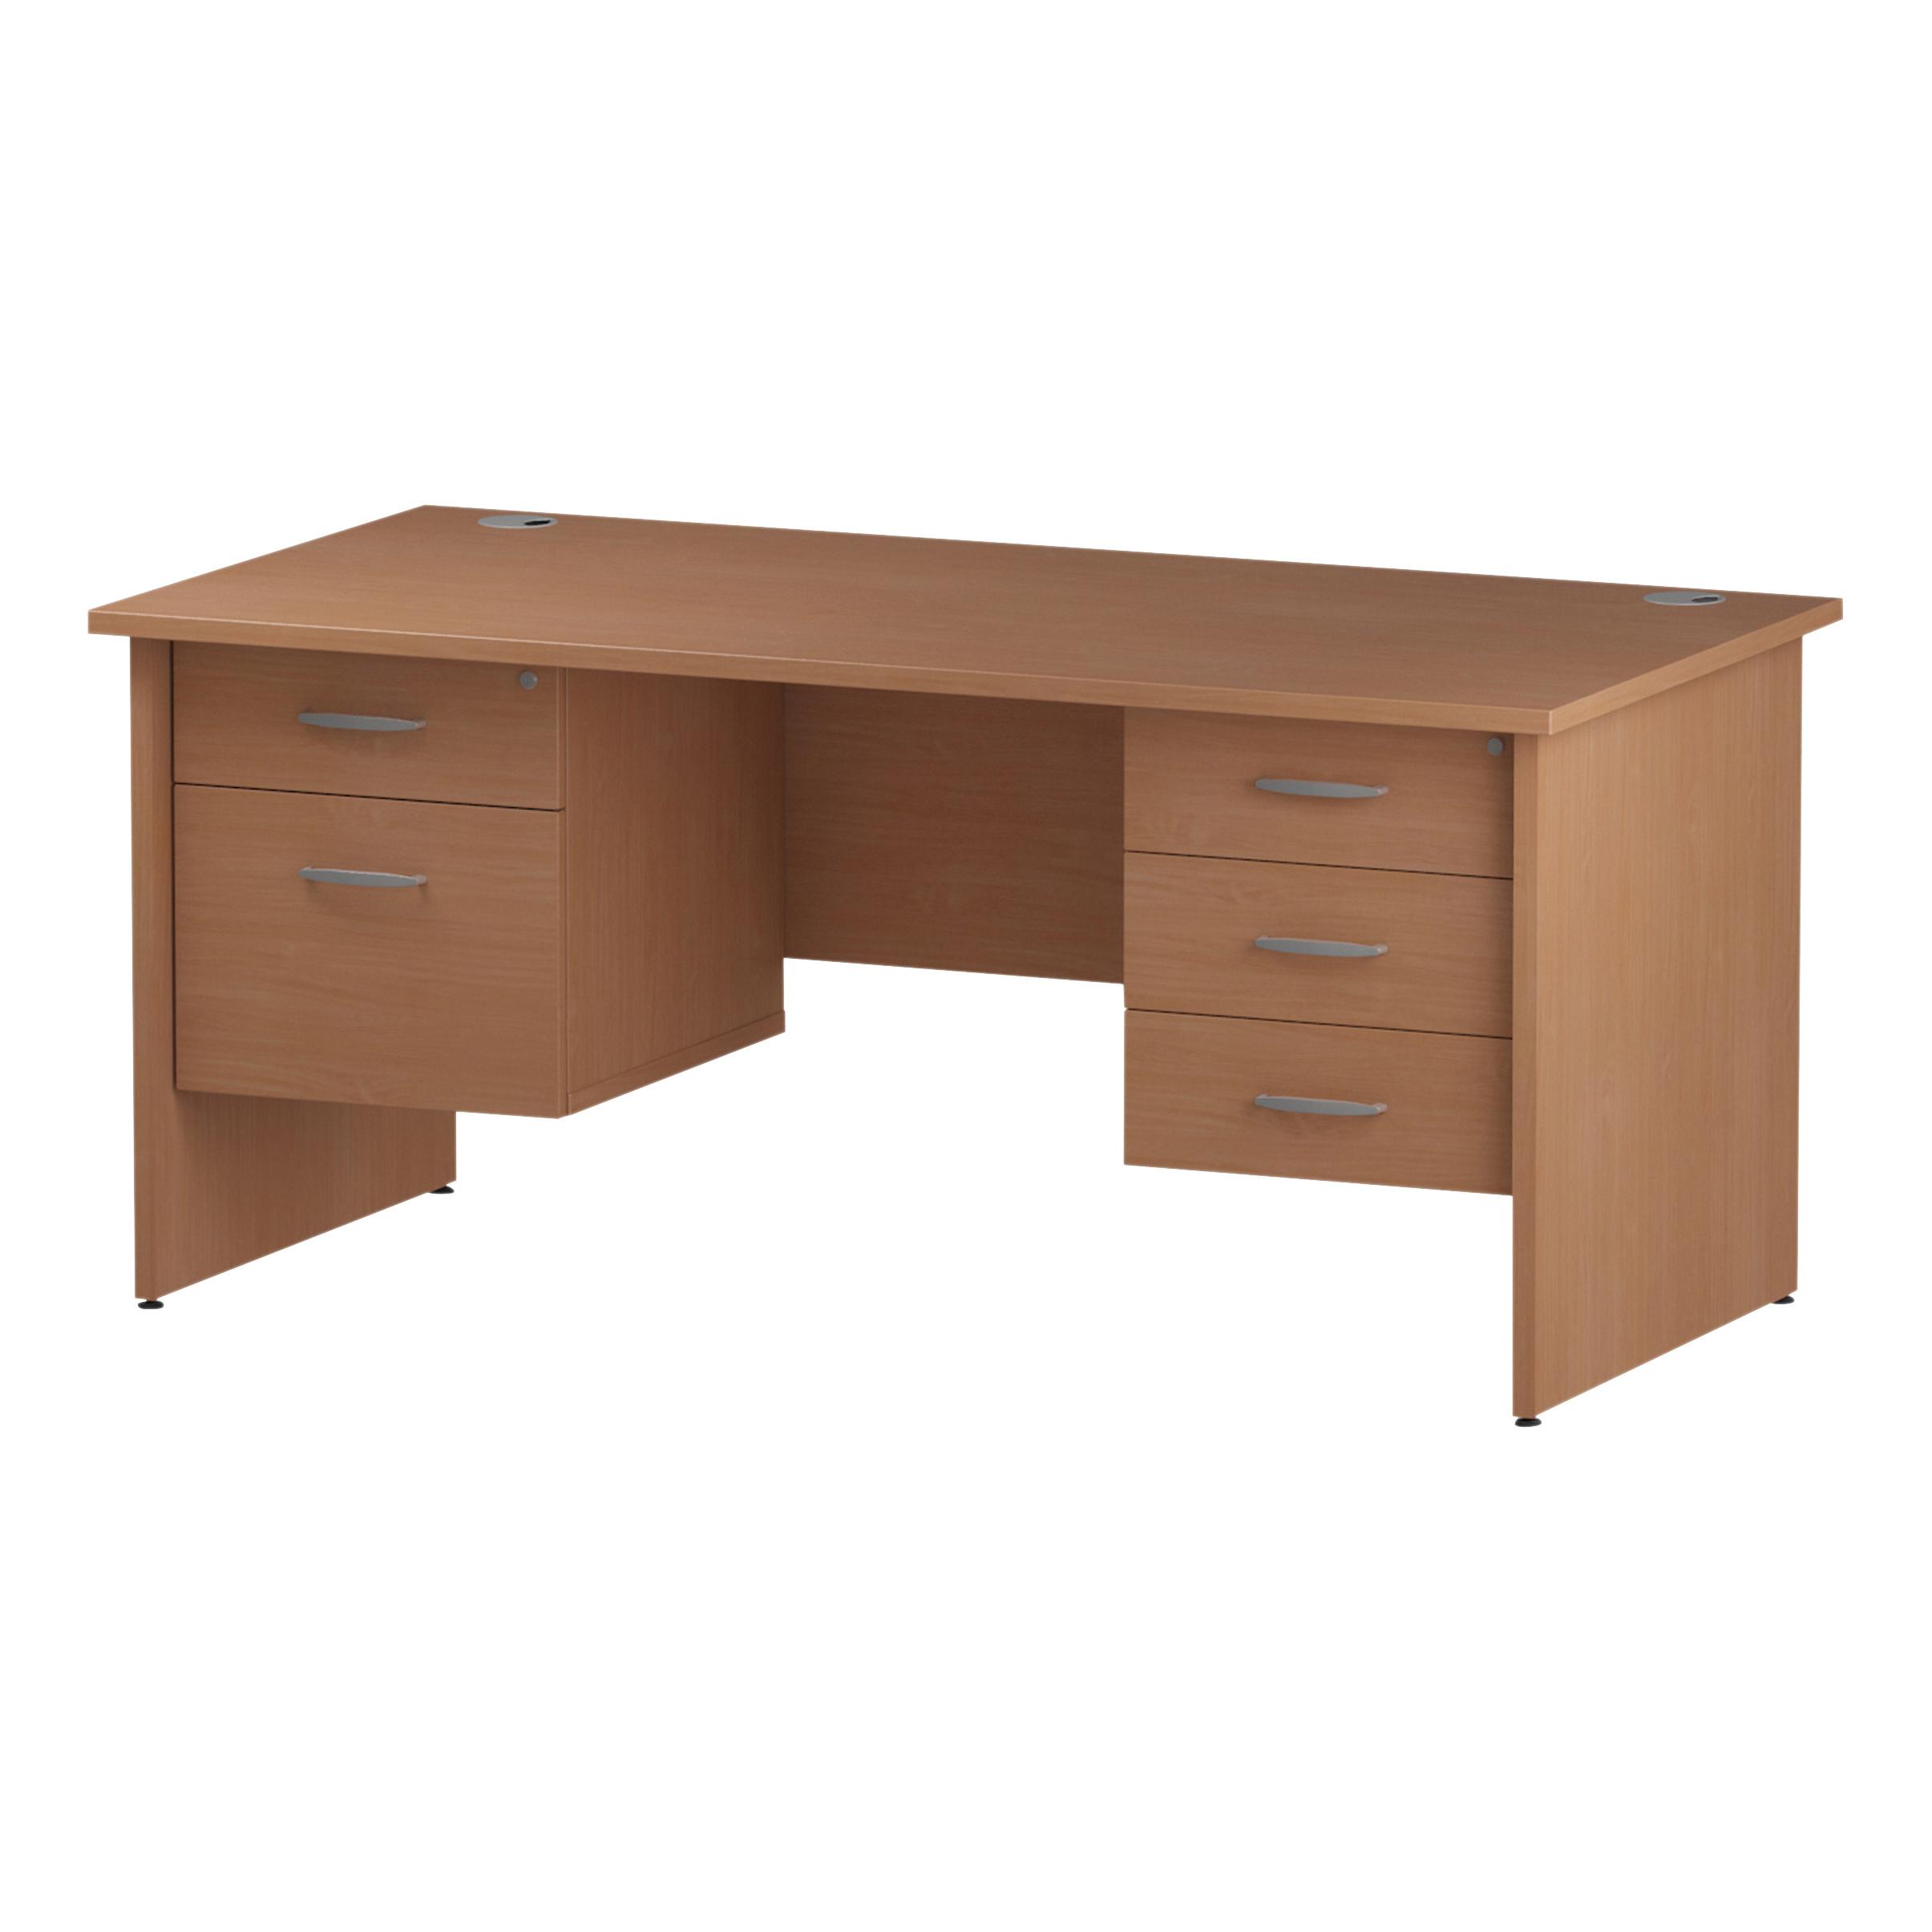 Trexus Rectangular Desk Panel End Leg 1600x800mm Double Fixed Pedestal 2&3 Drawers Beech Ref I001751